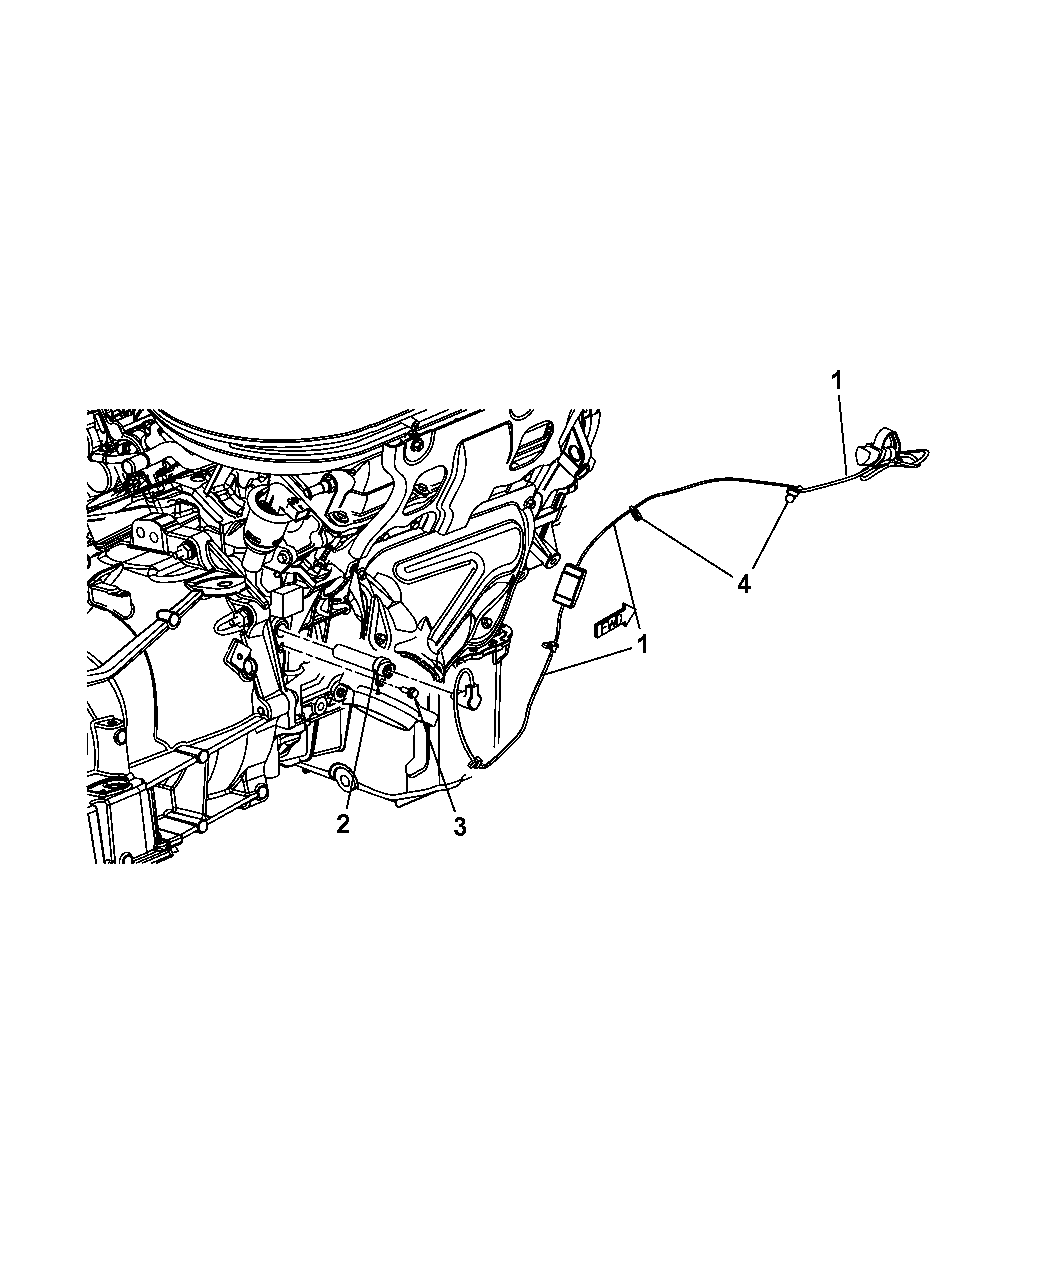 2015 Chrysler 200 Engine Cylinder Block Heater - Thumbnail 1